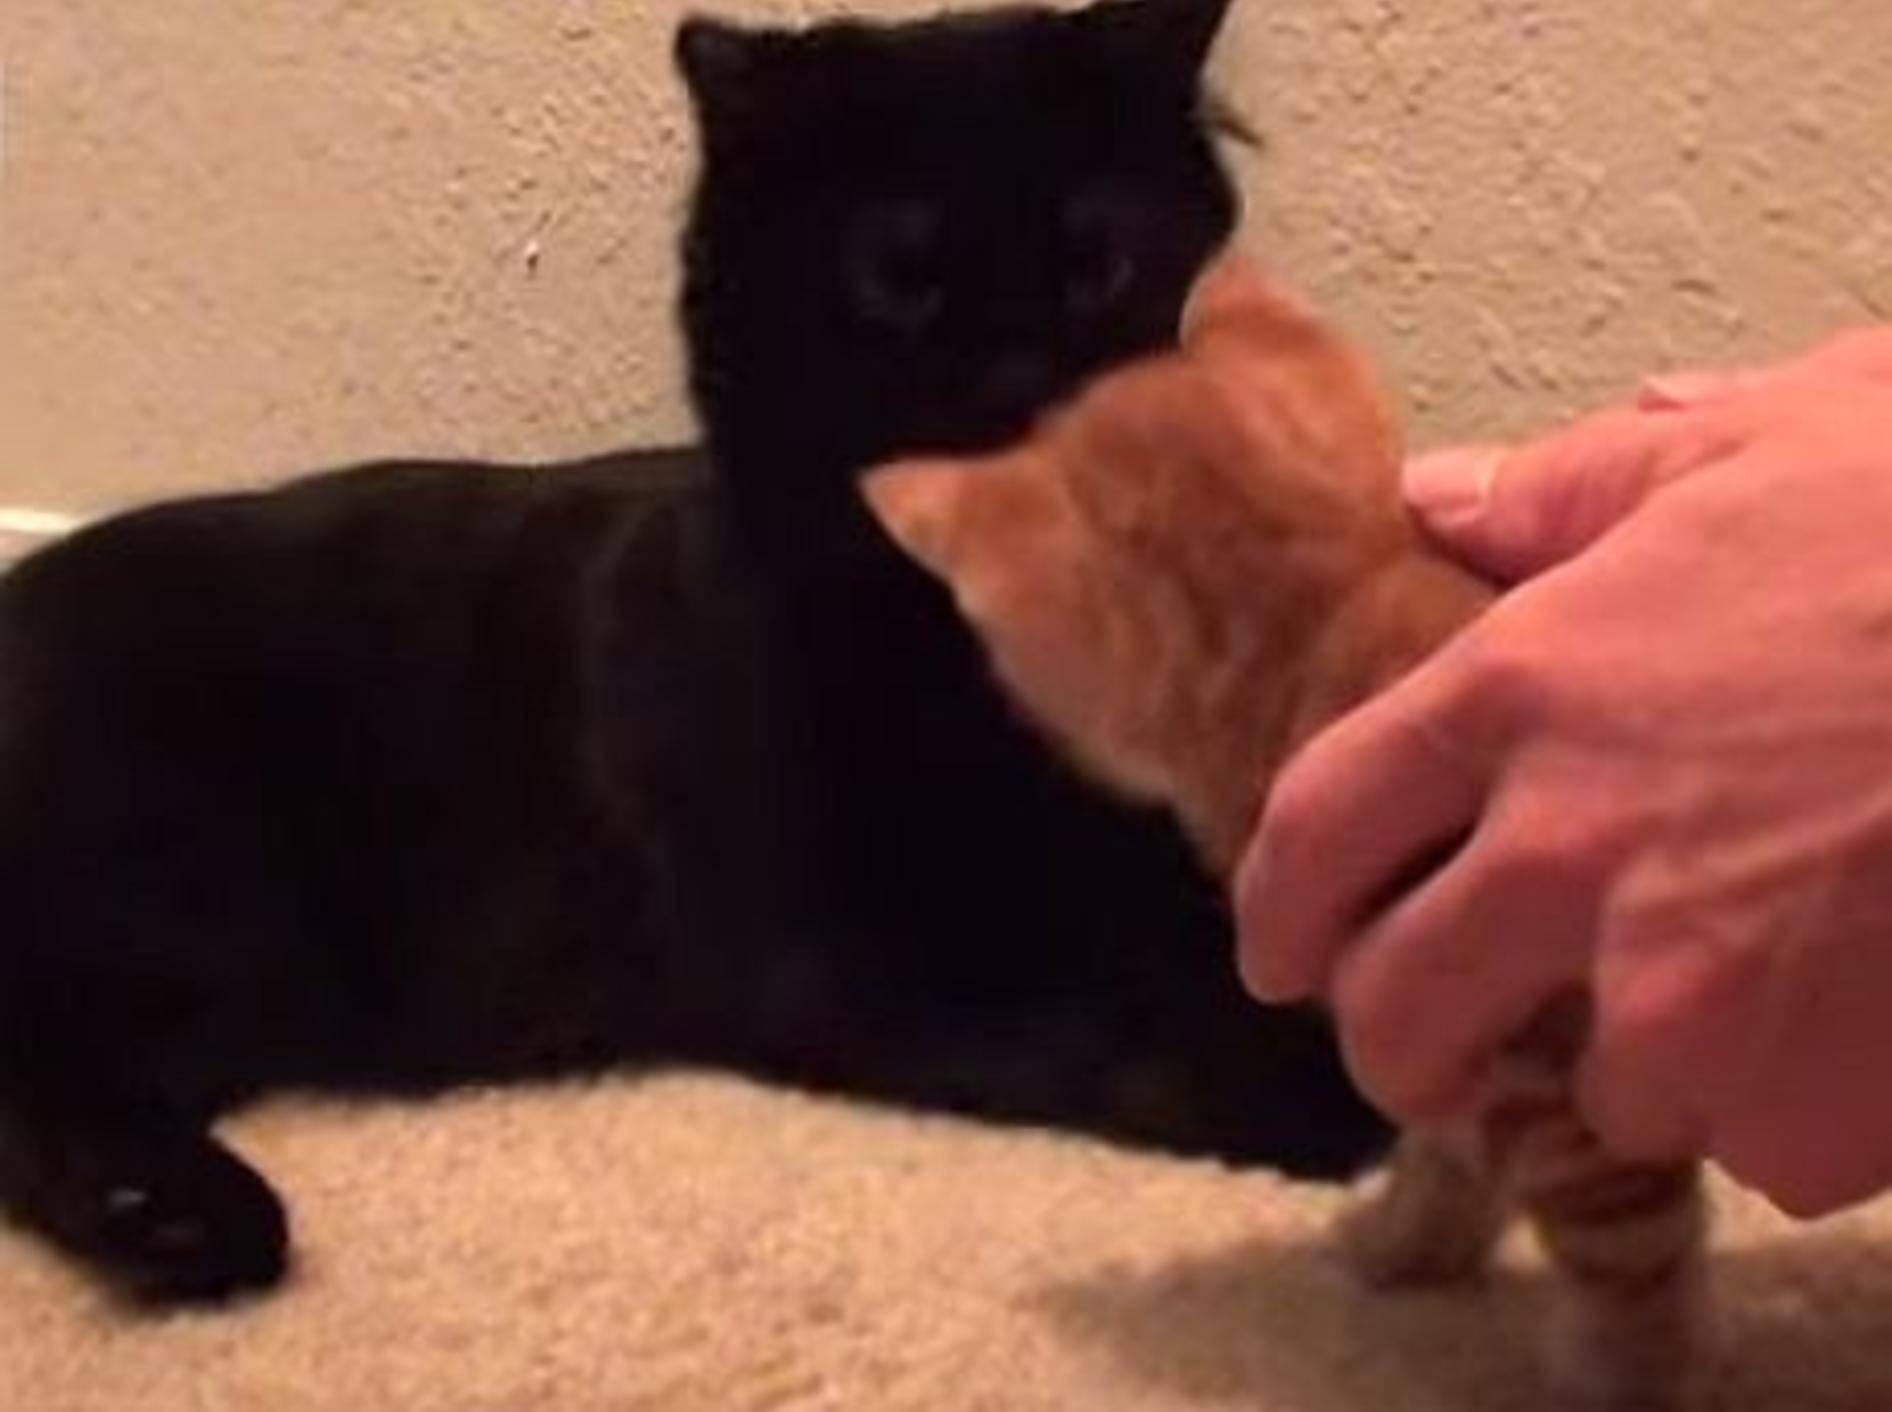 Videotipps: Katzenbaby an ältere Katze gewöhnen – Bild: Youtube / Cole theBlackCat